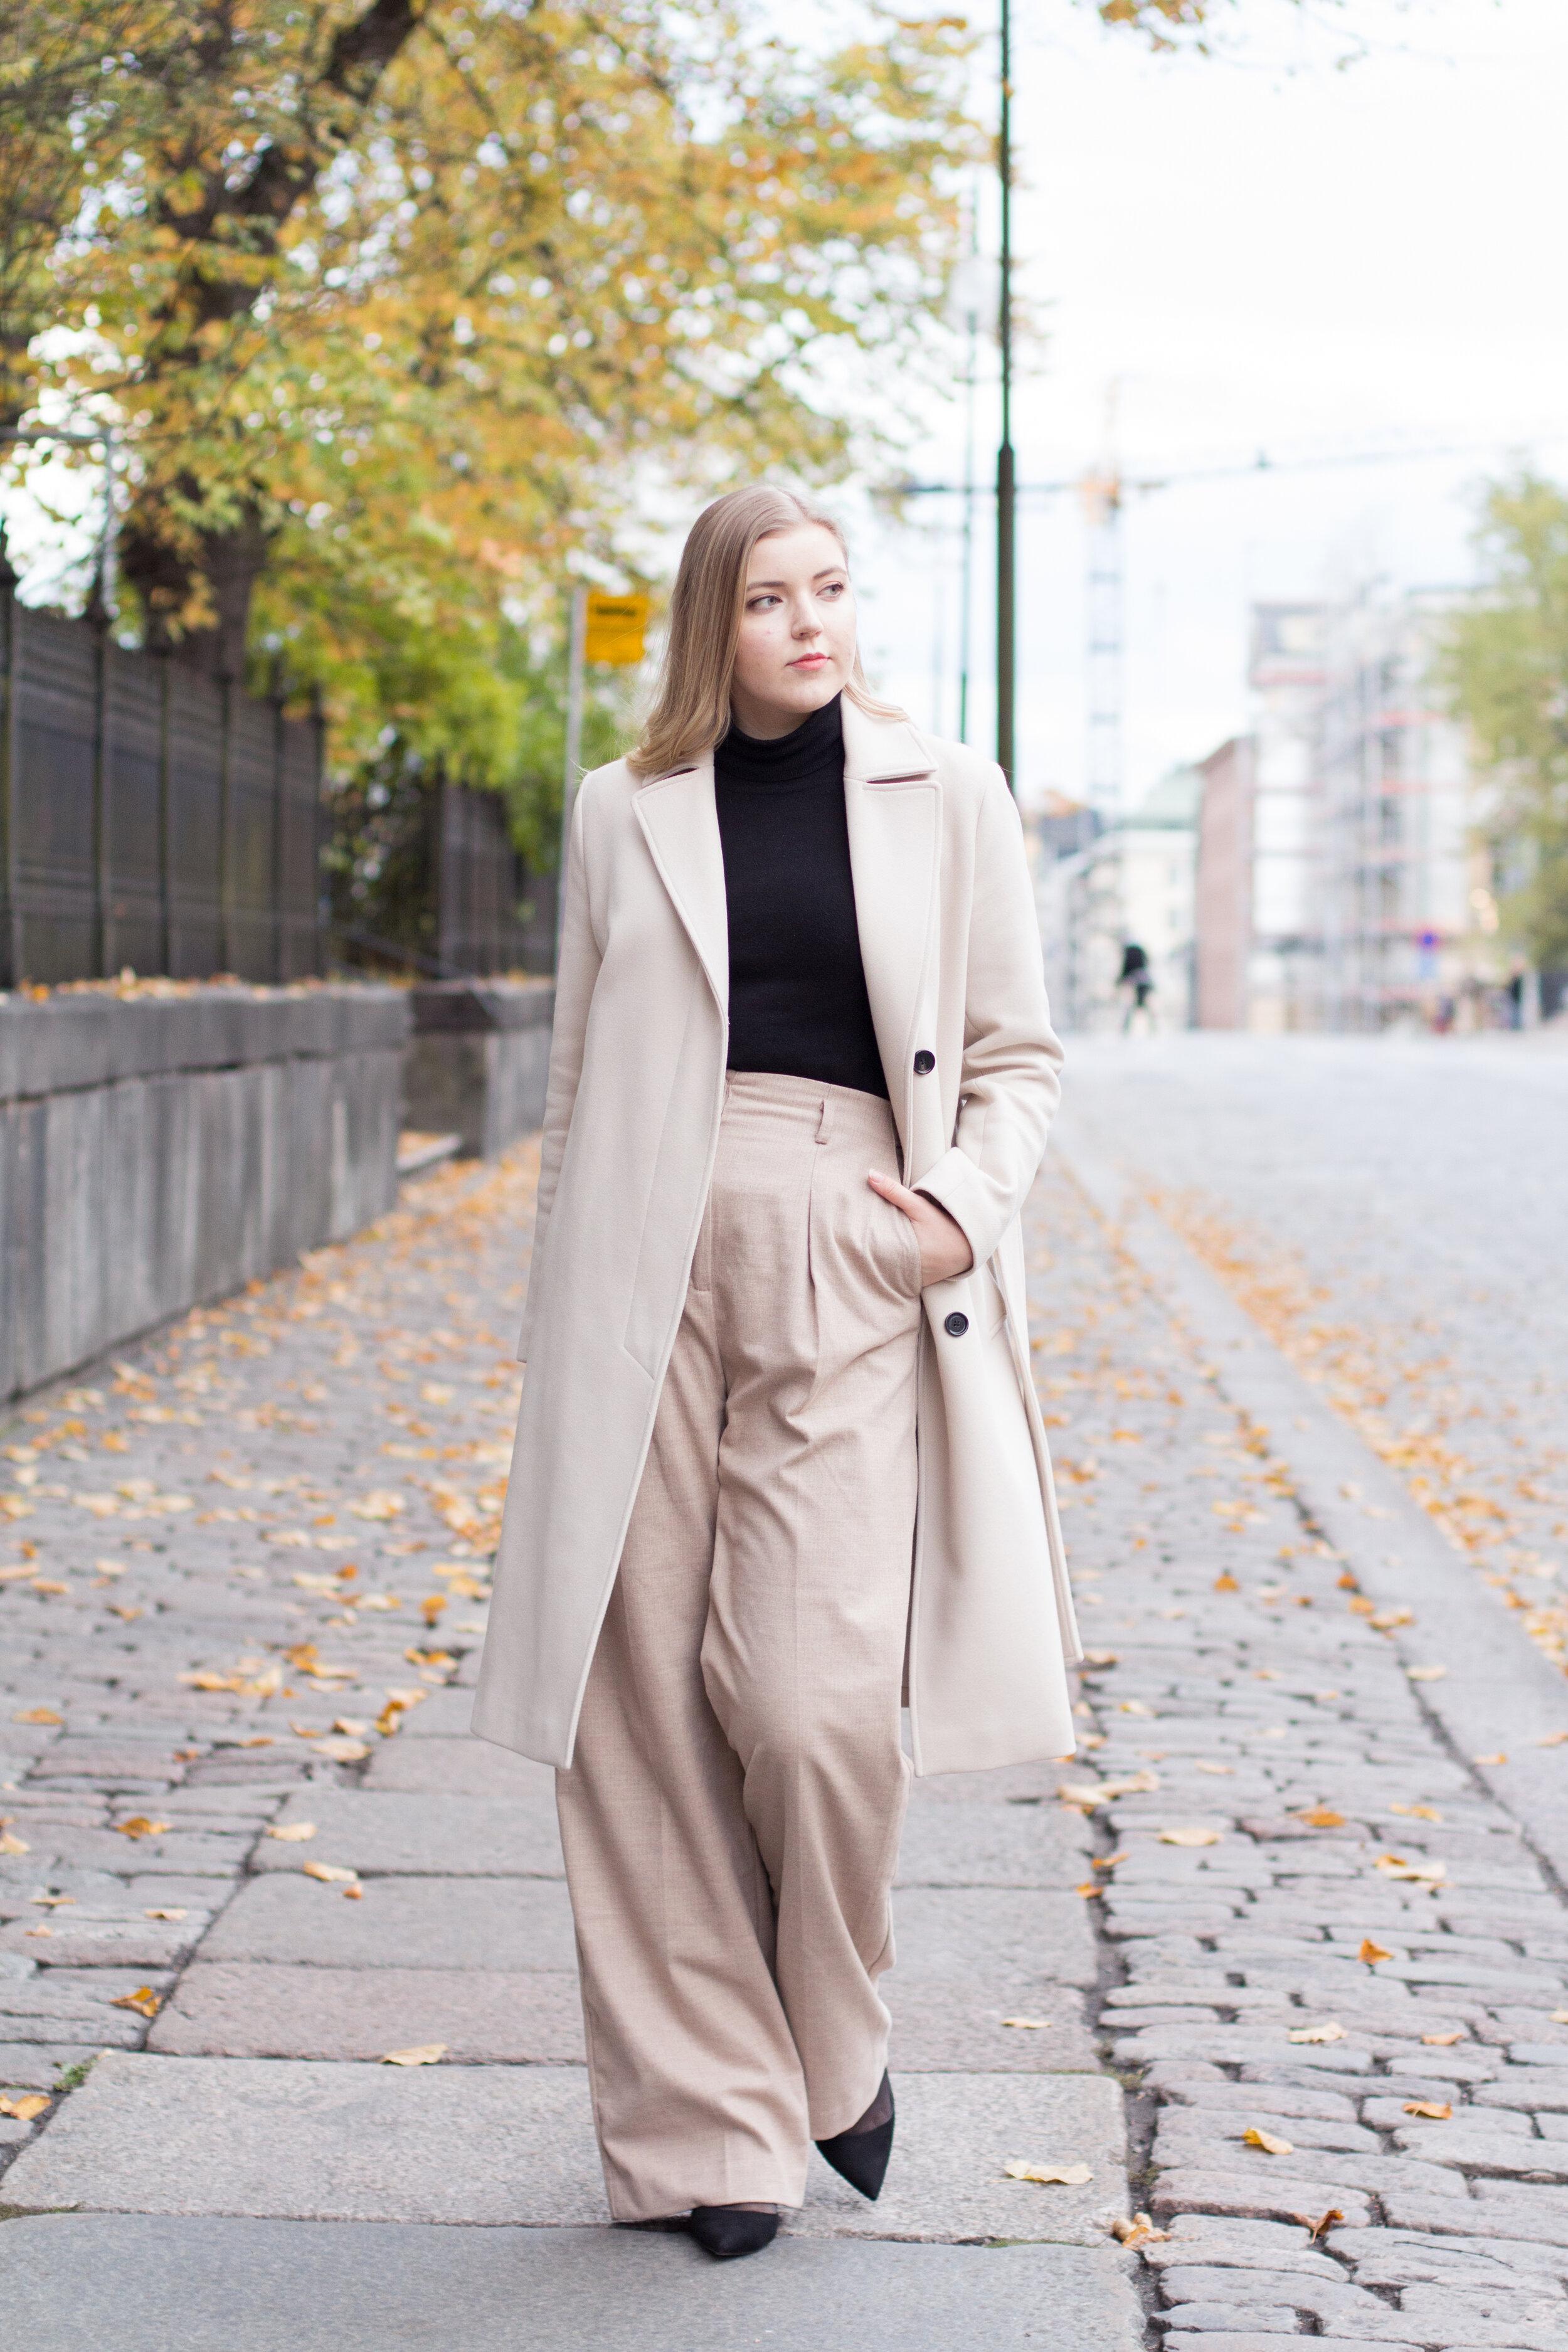 Beige outfit girl walking street.jpg